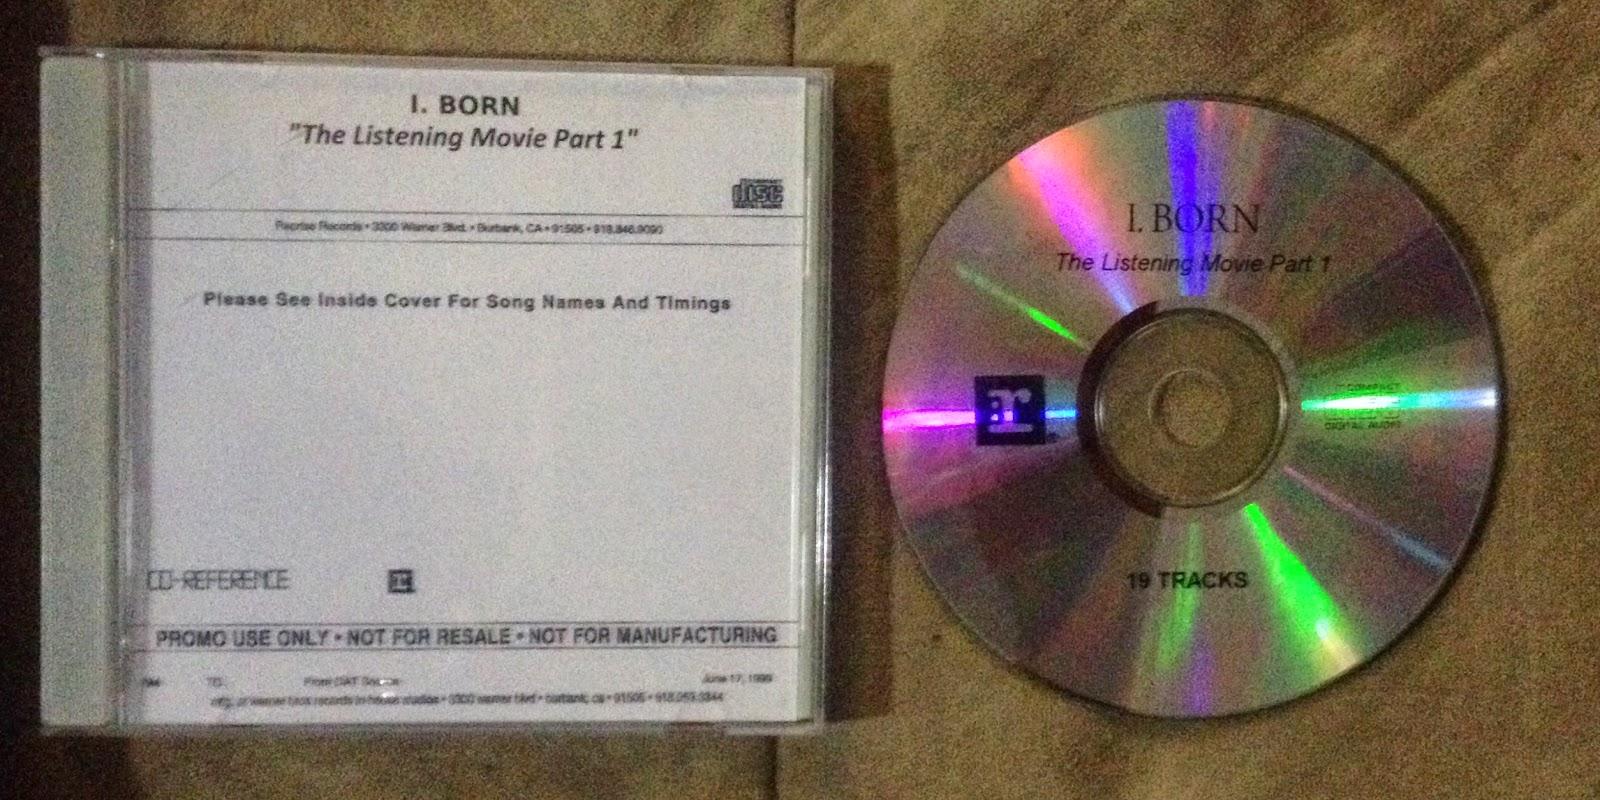 I. Born  - The Listening Movie Part 1